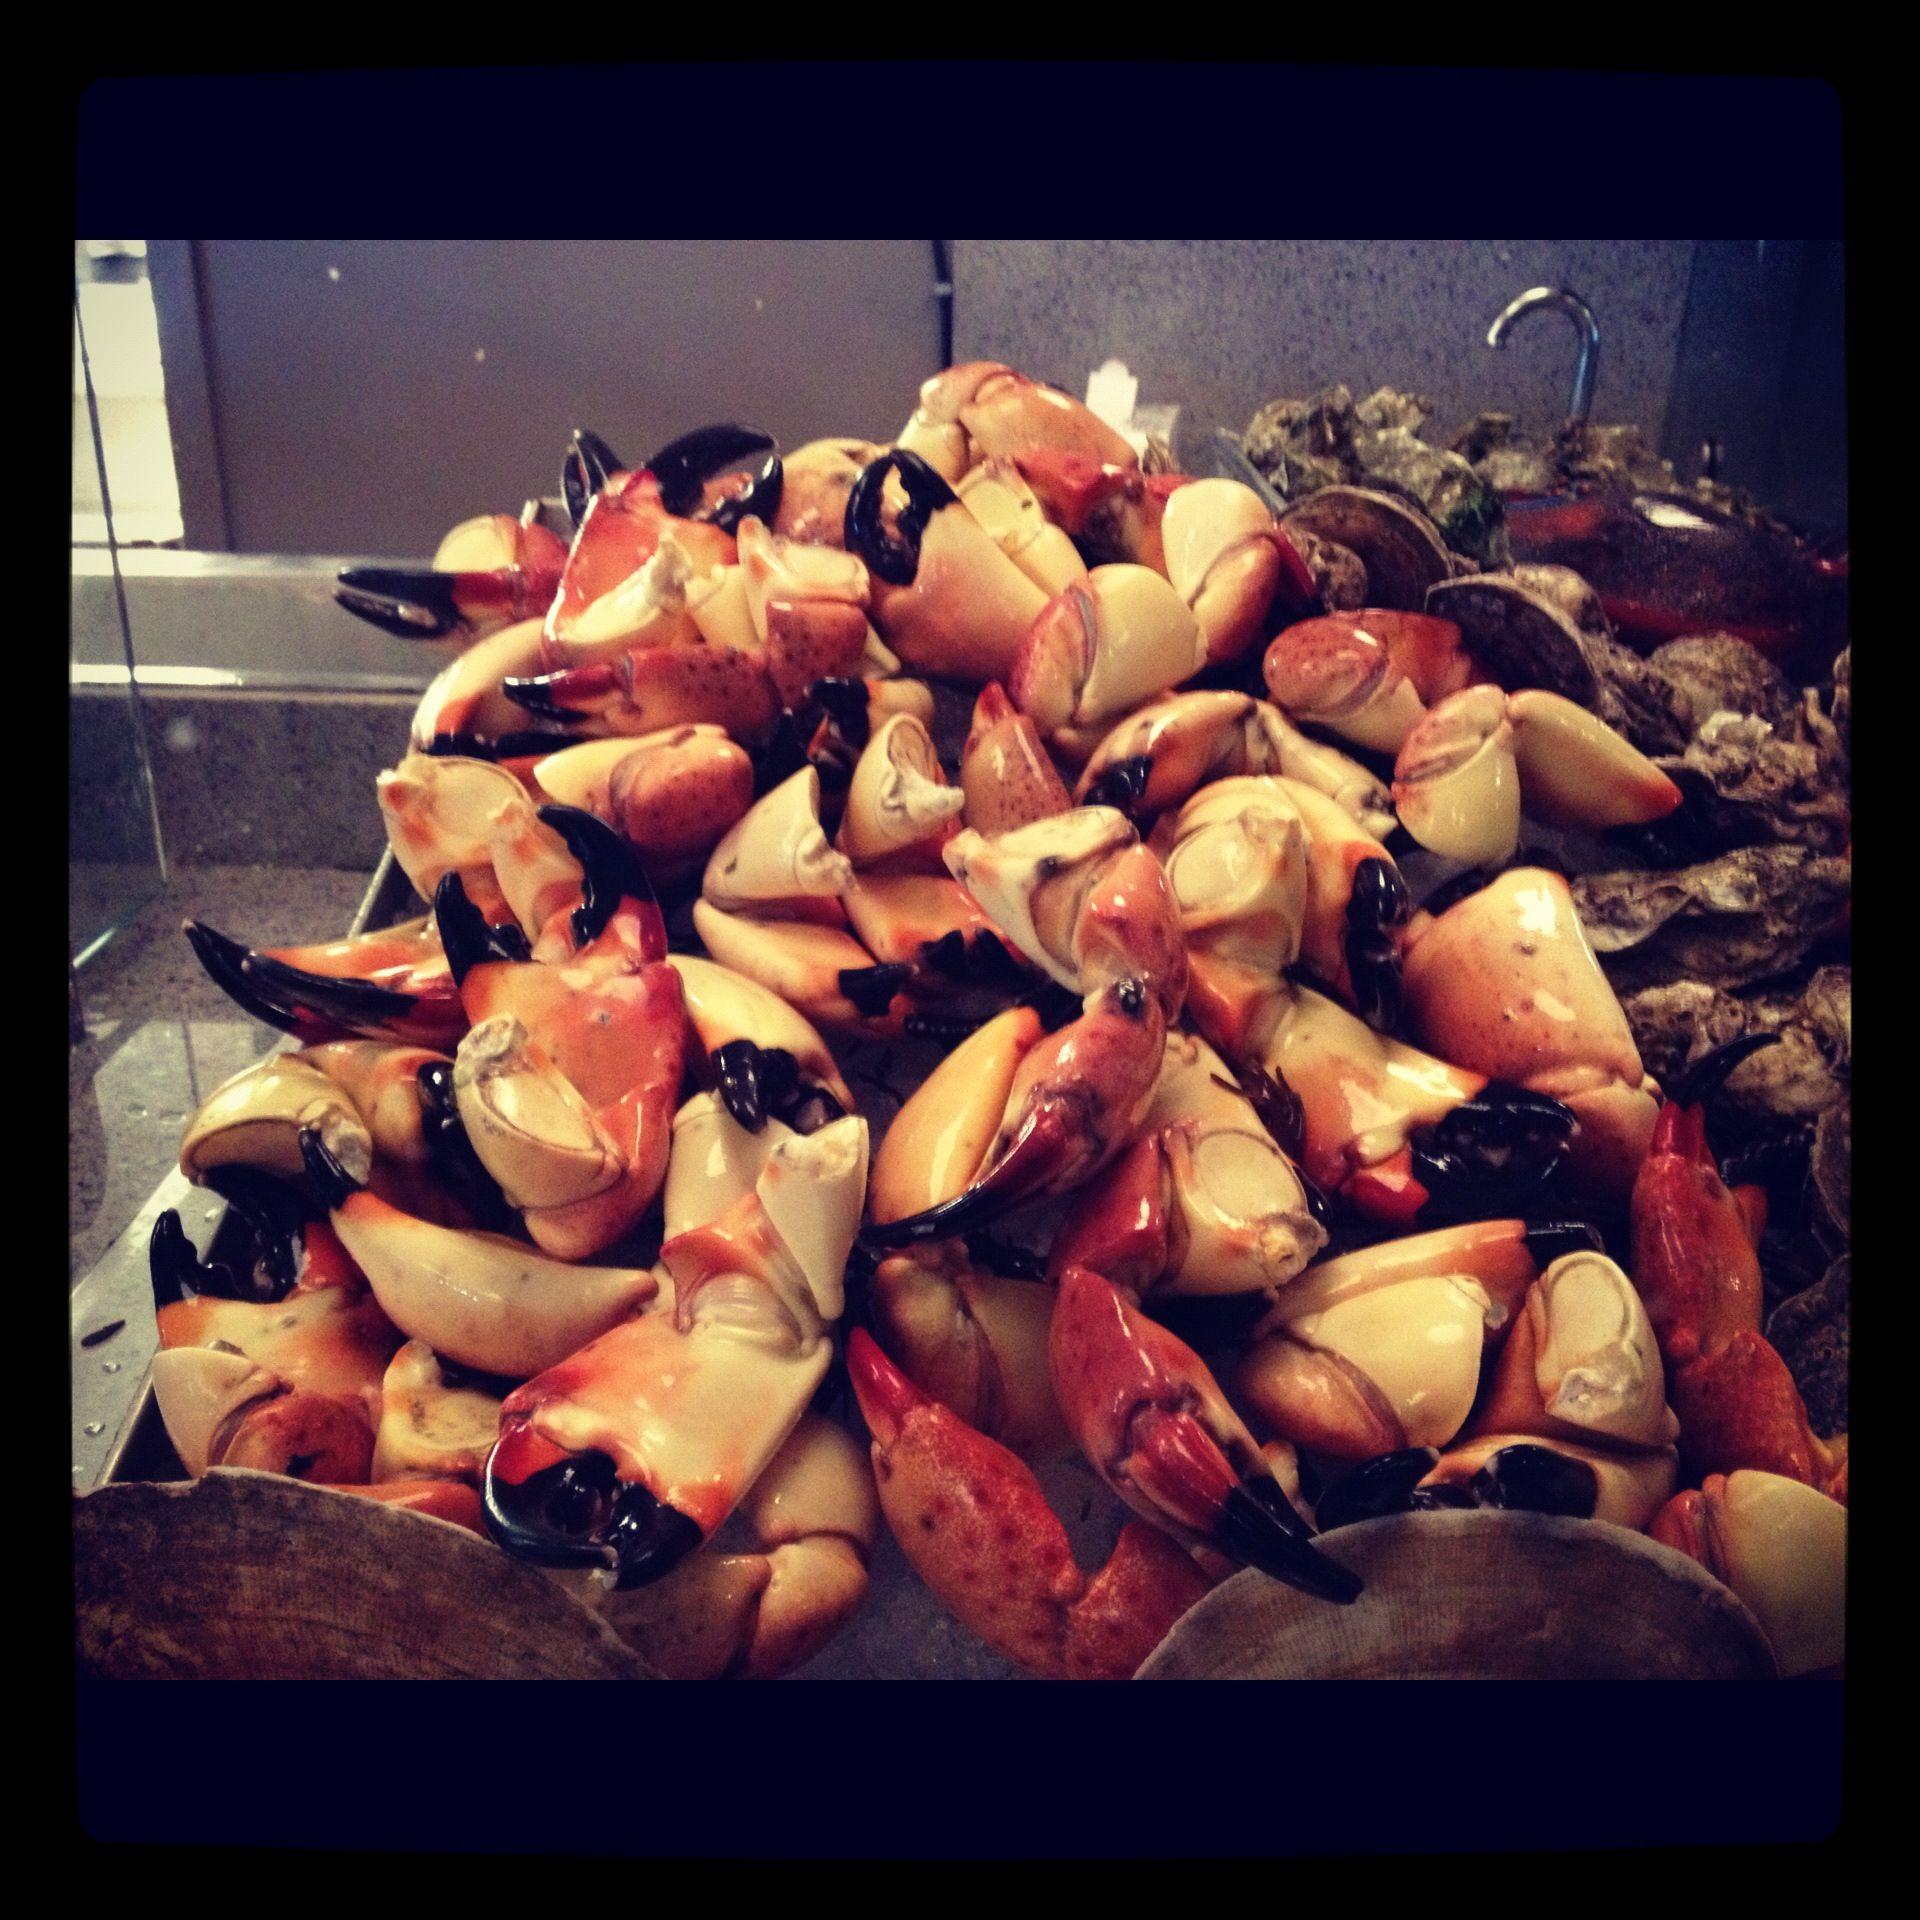 La Gloutonnerie is now serving fresh FL stone crabs.